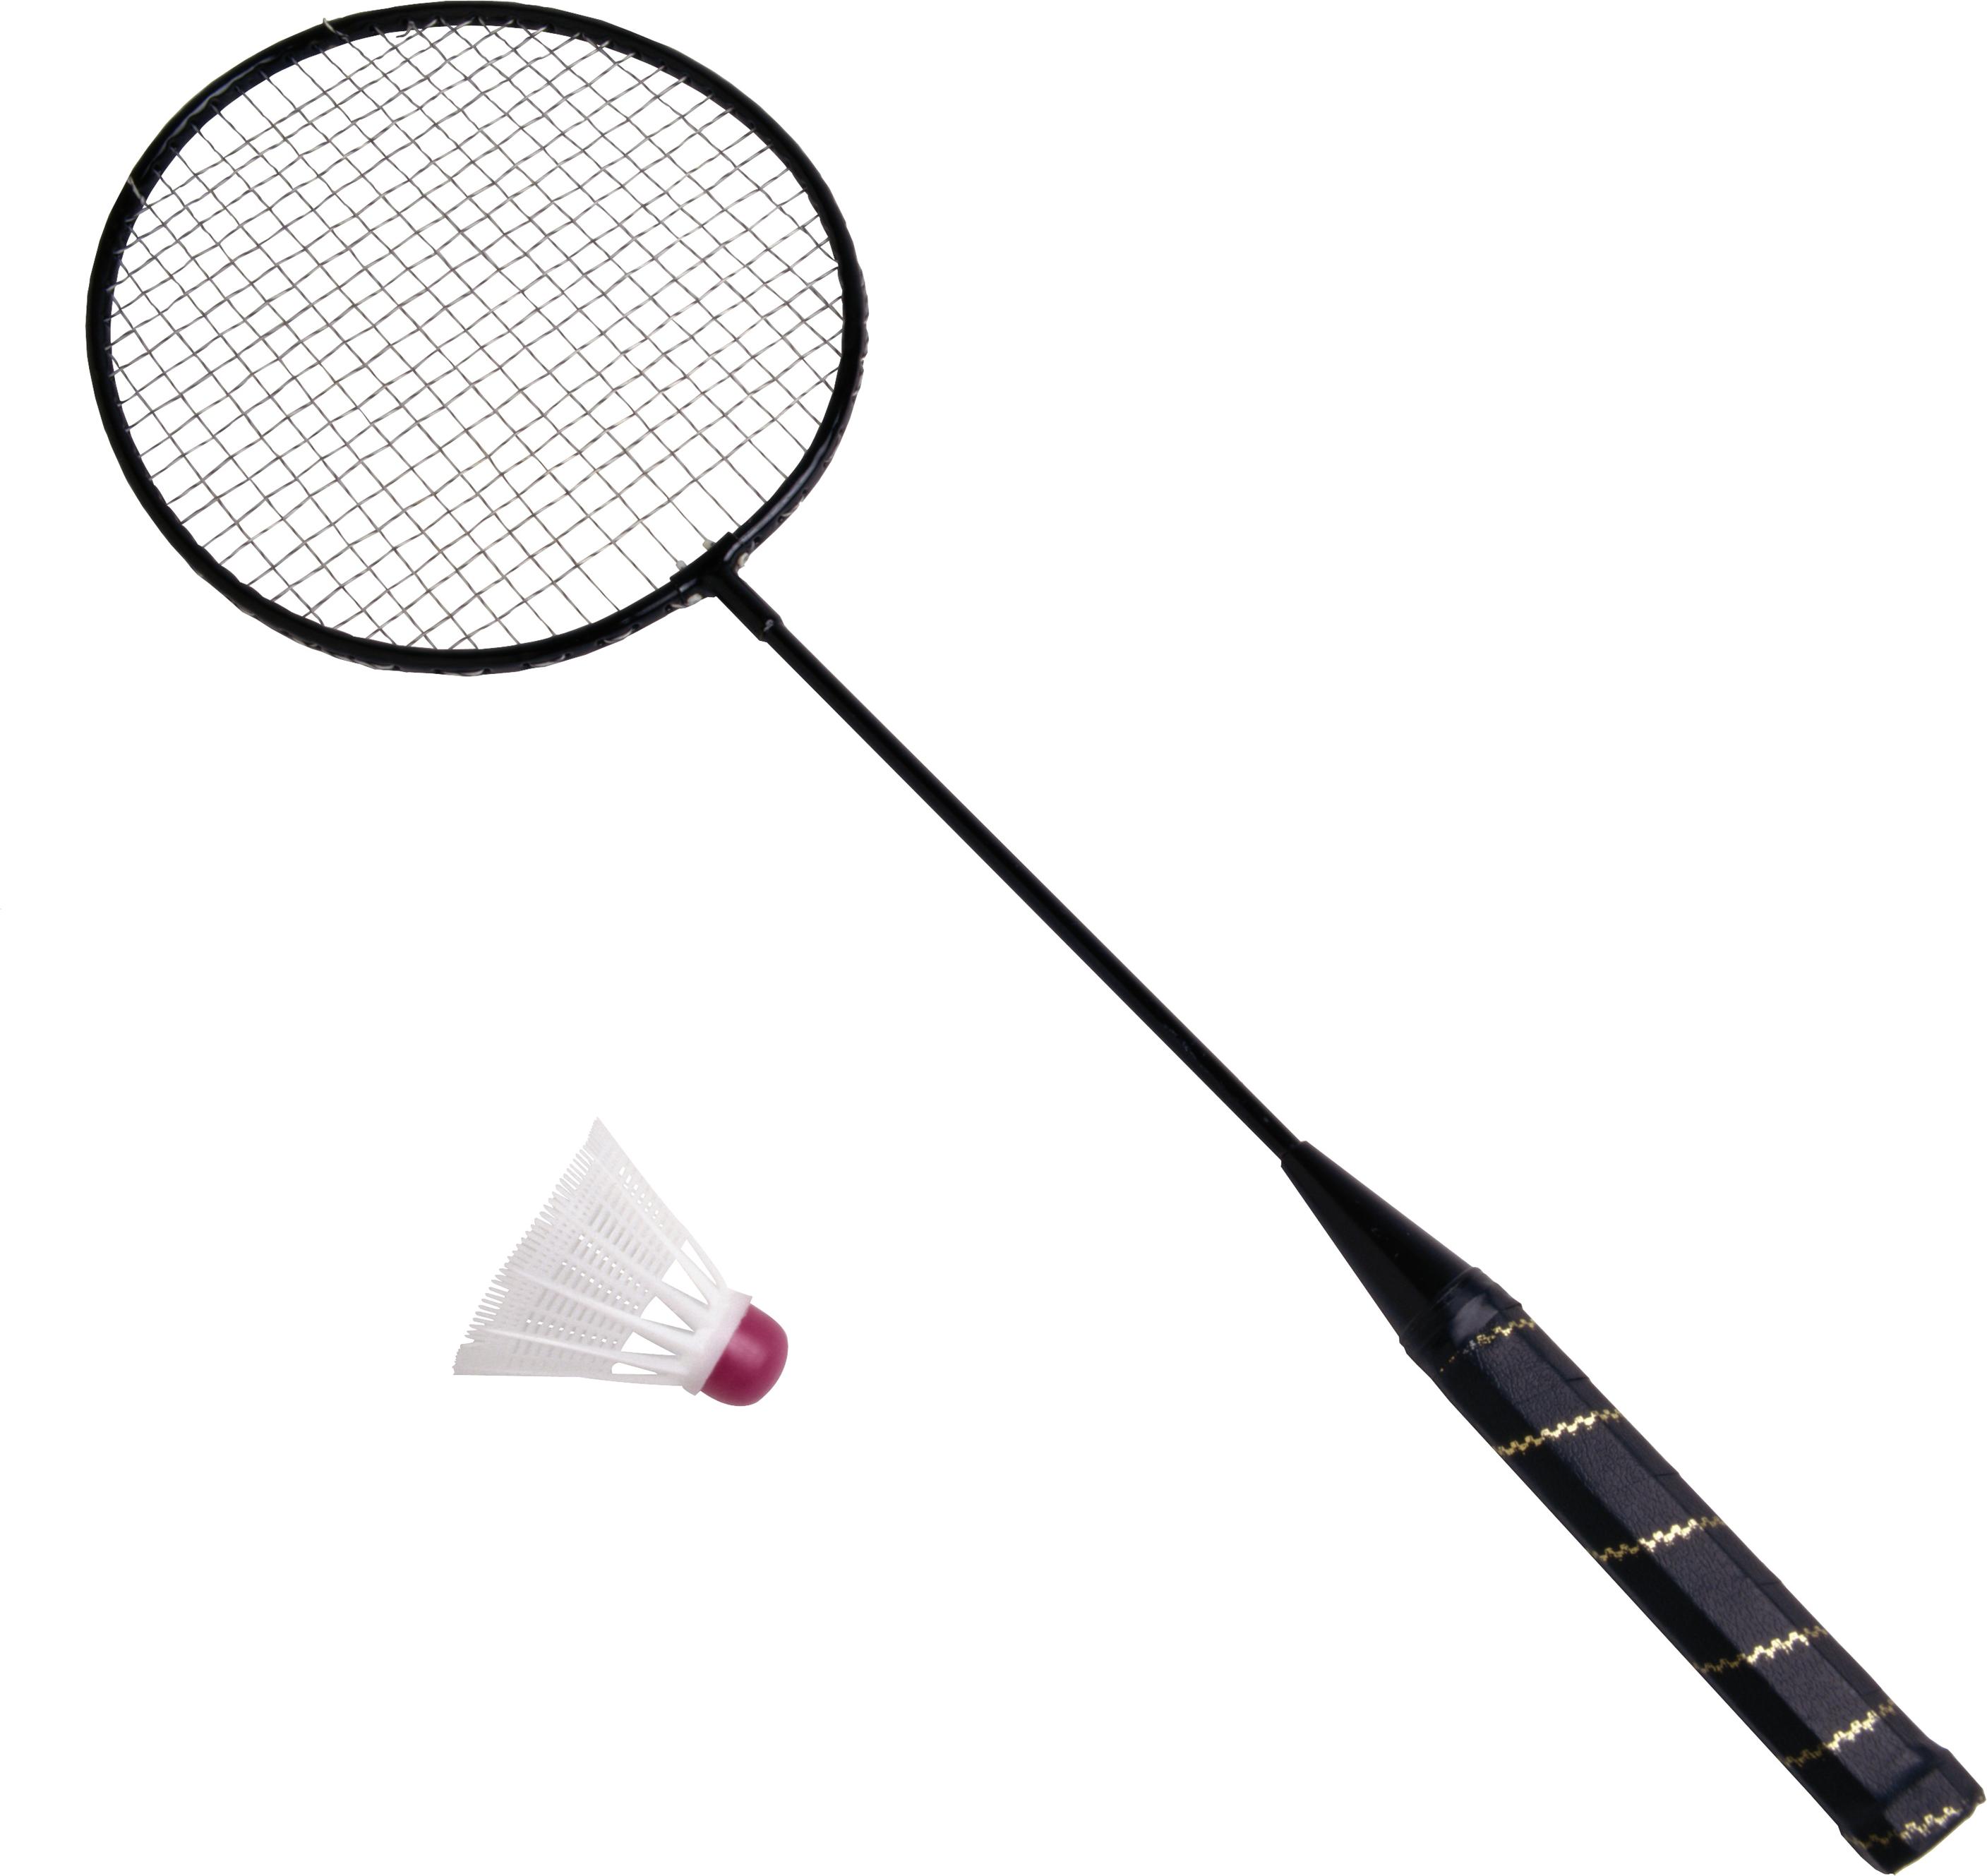 Design A Home Game Badminton Racket Png Image